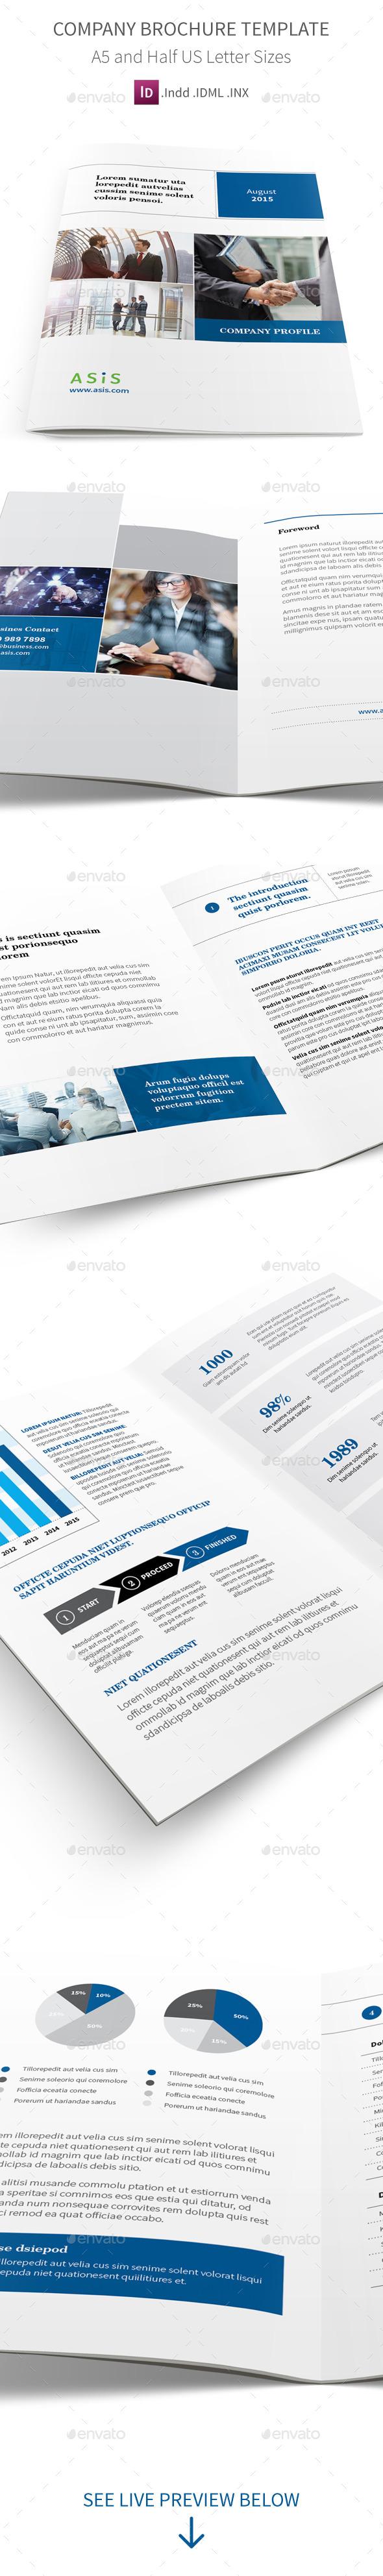 company profile brochure a5 half letter sizes pinterest